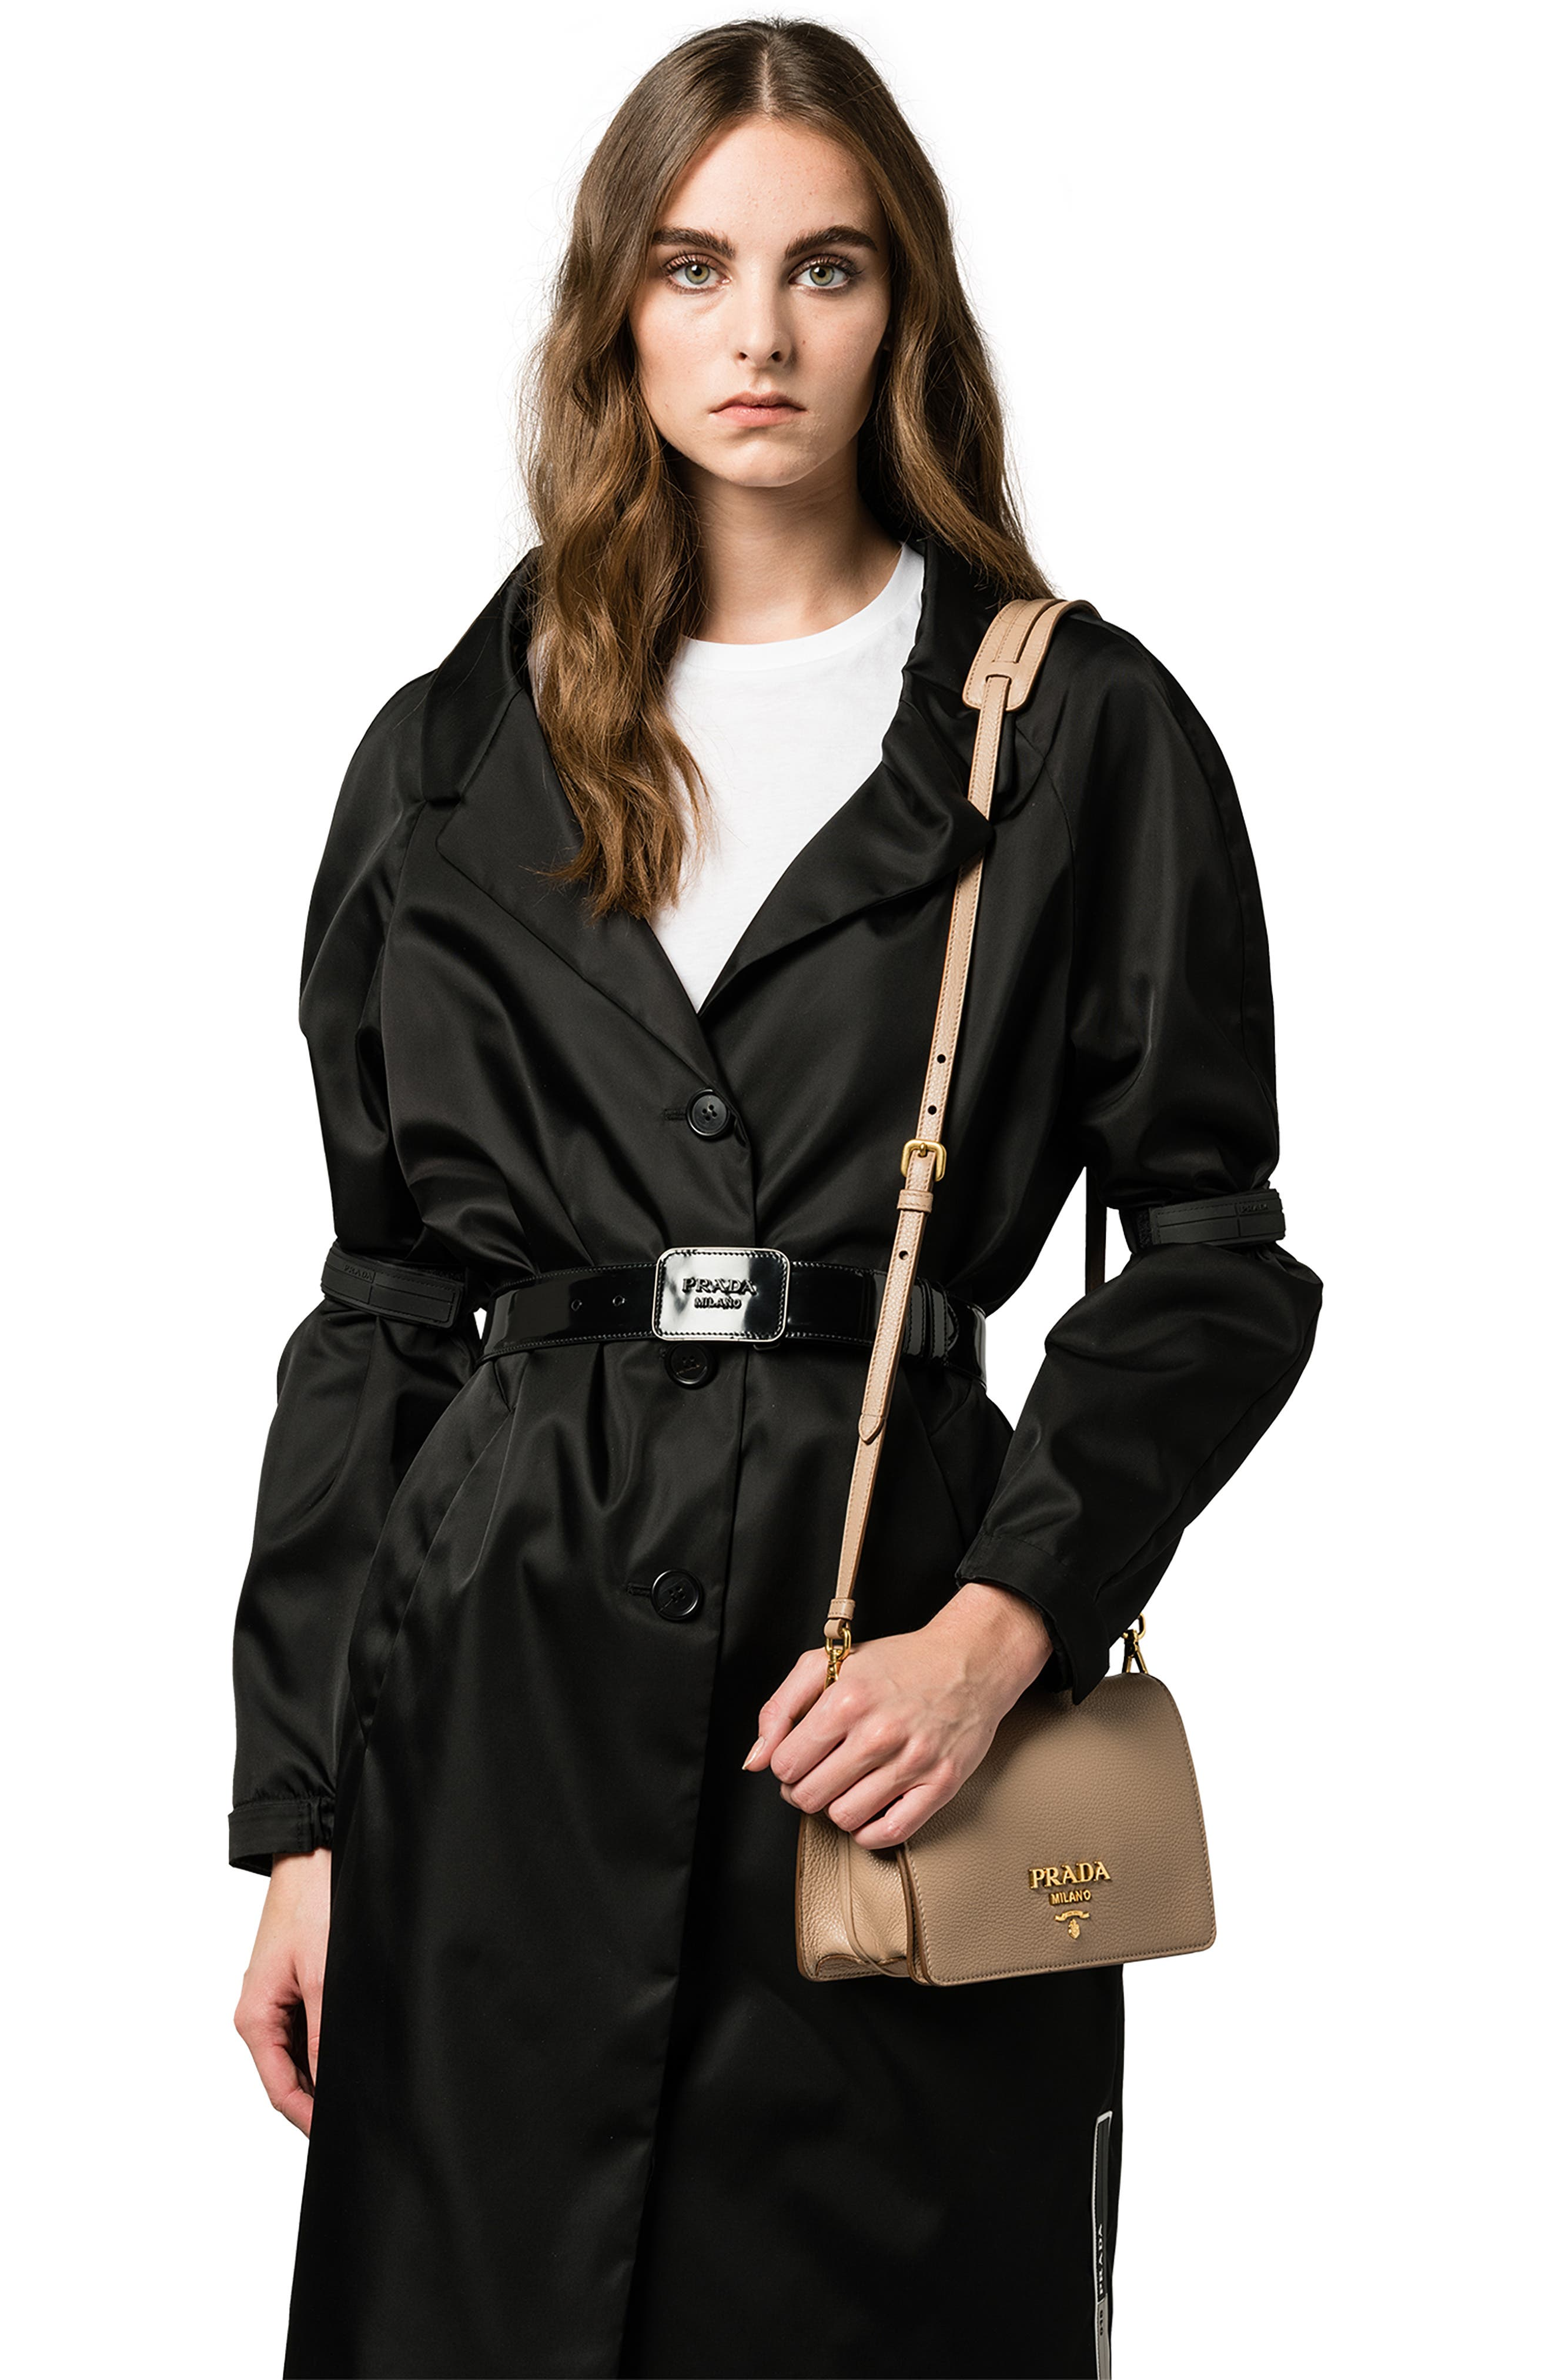 PRADA, Vitello Daino Double Compartment Leather Shoulder Bag, Alternate thumbnail 2, color, CAMMEO